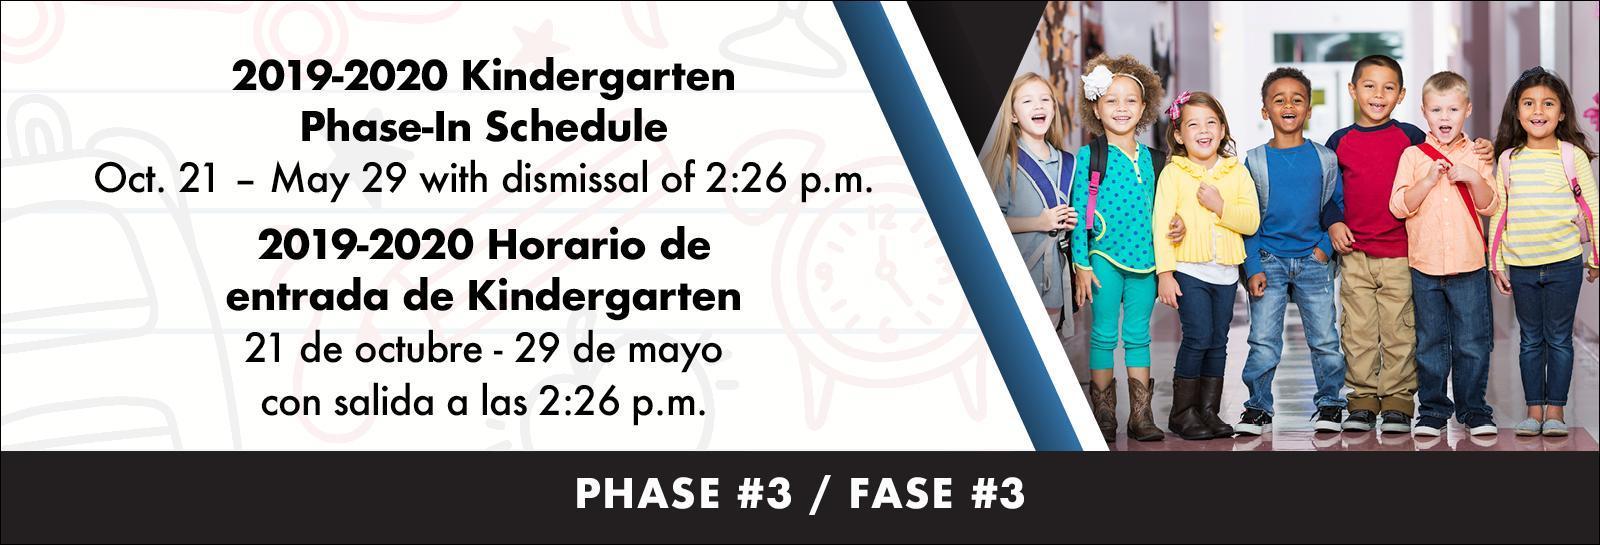 2019-2020 Kindergarten Phase-In Schedule